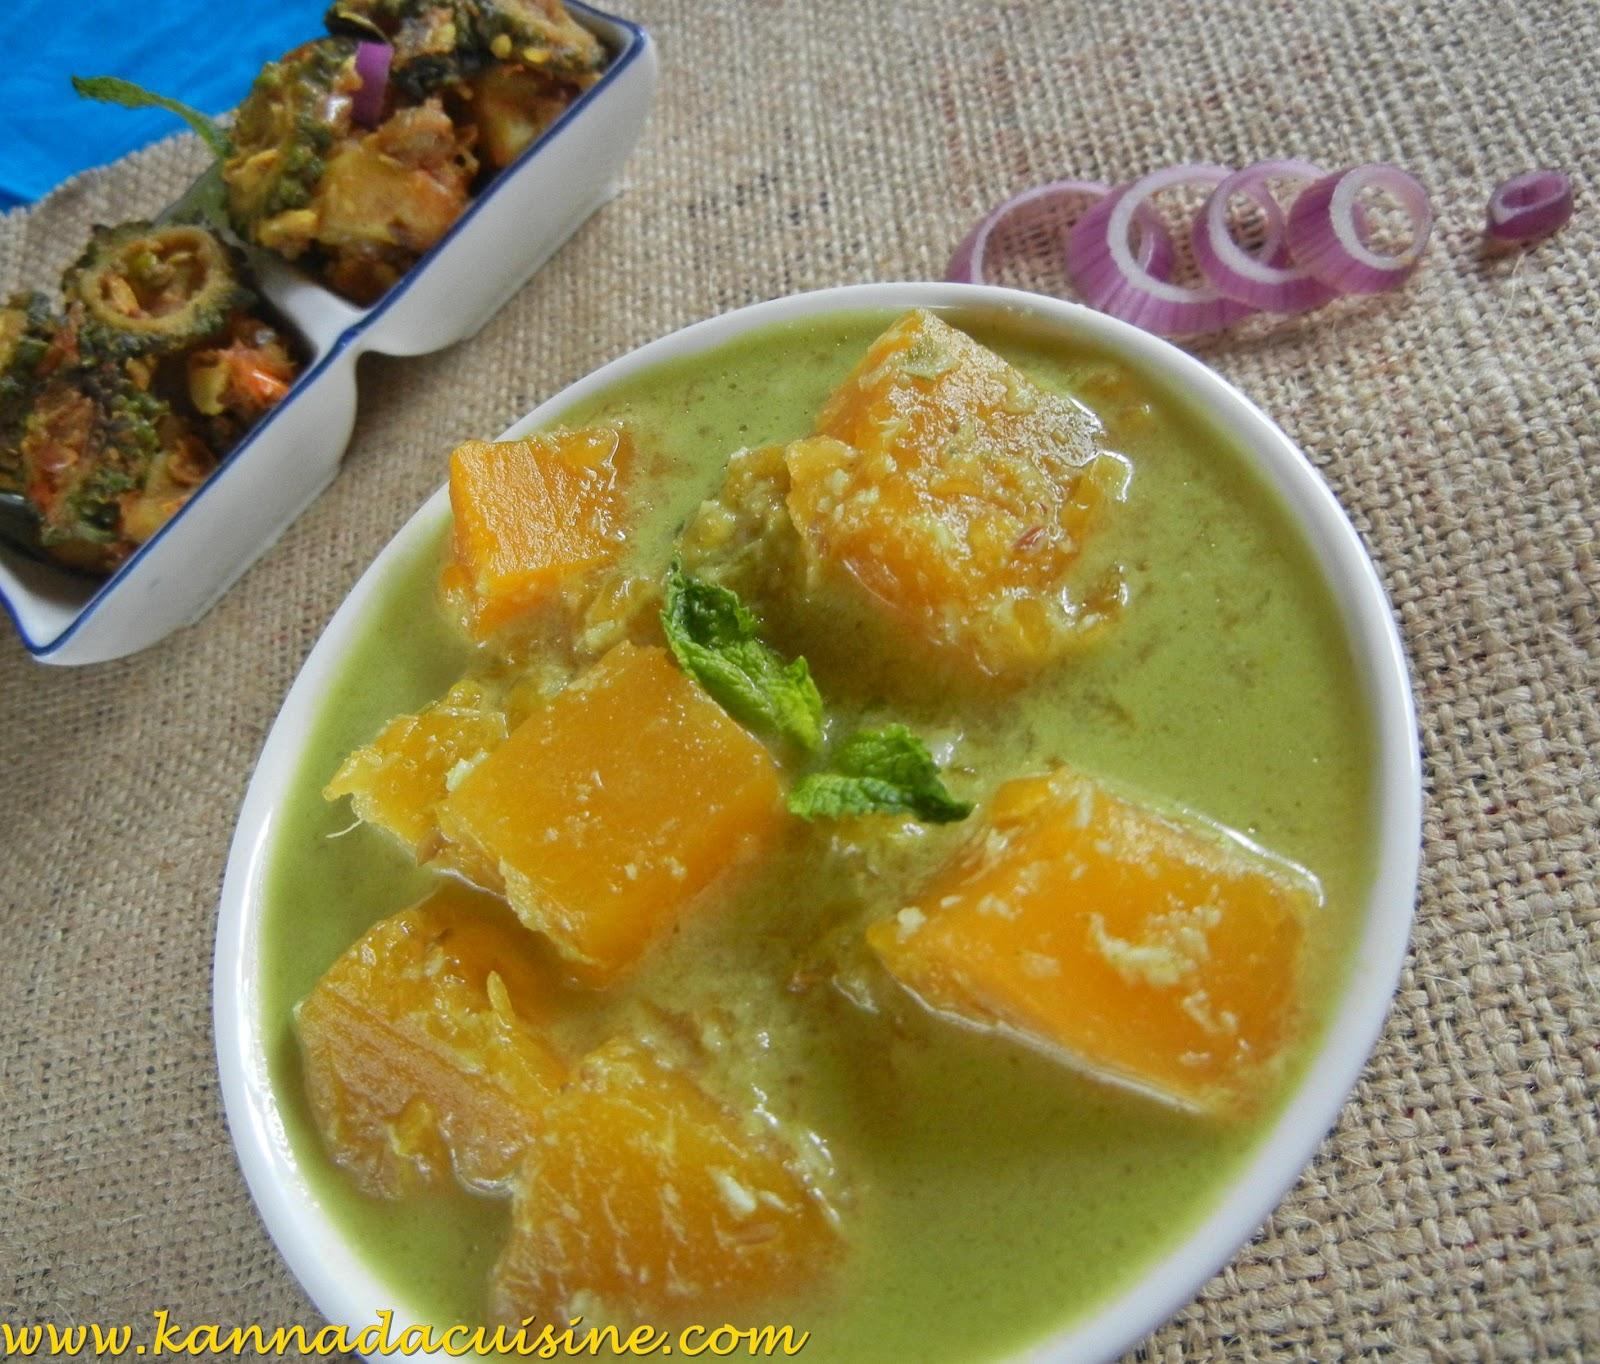 Kannada cuisine kumbalakayi kayirasa pumpkin coconut curry kannada cuisine forumfinder Gallery